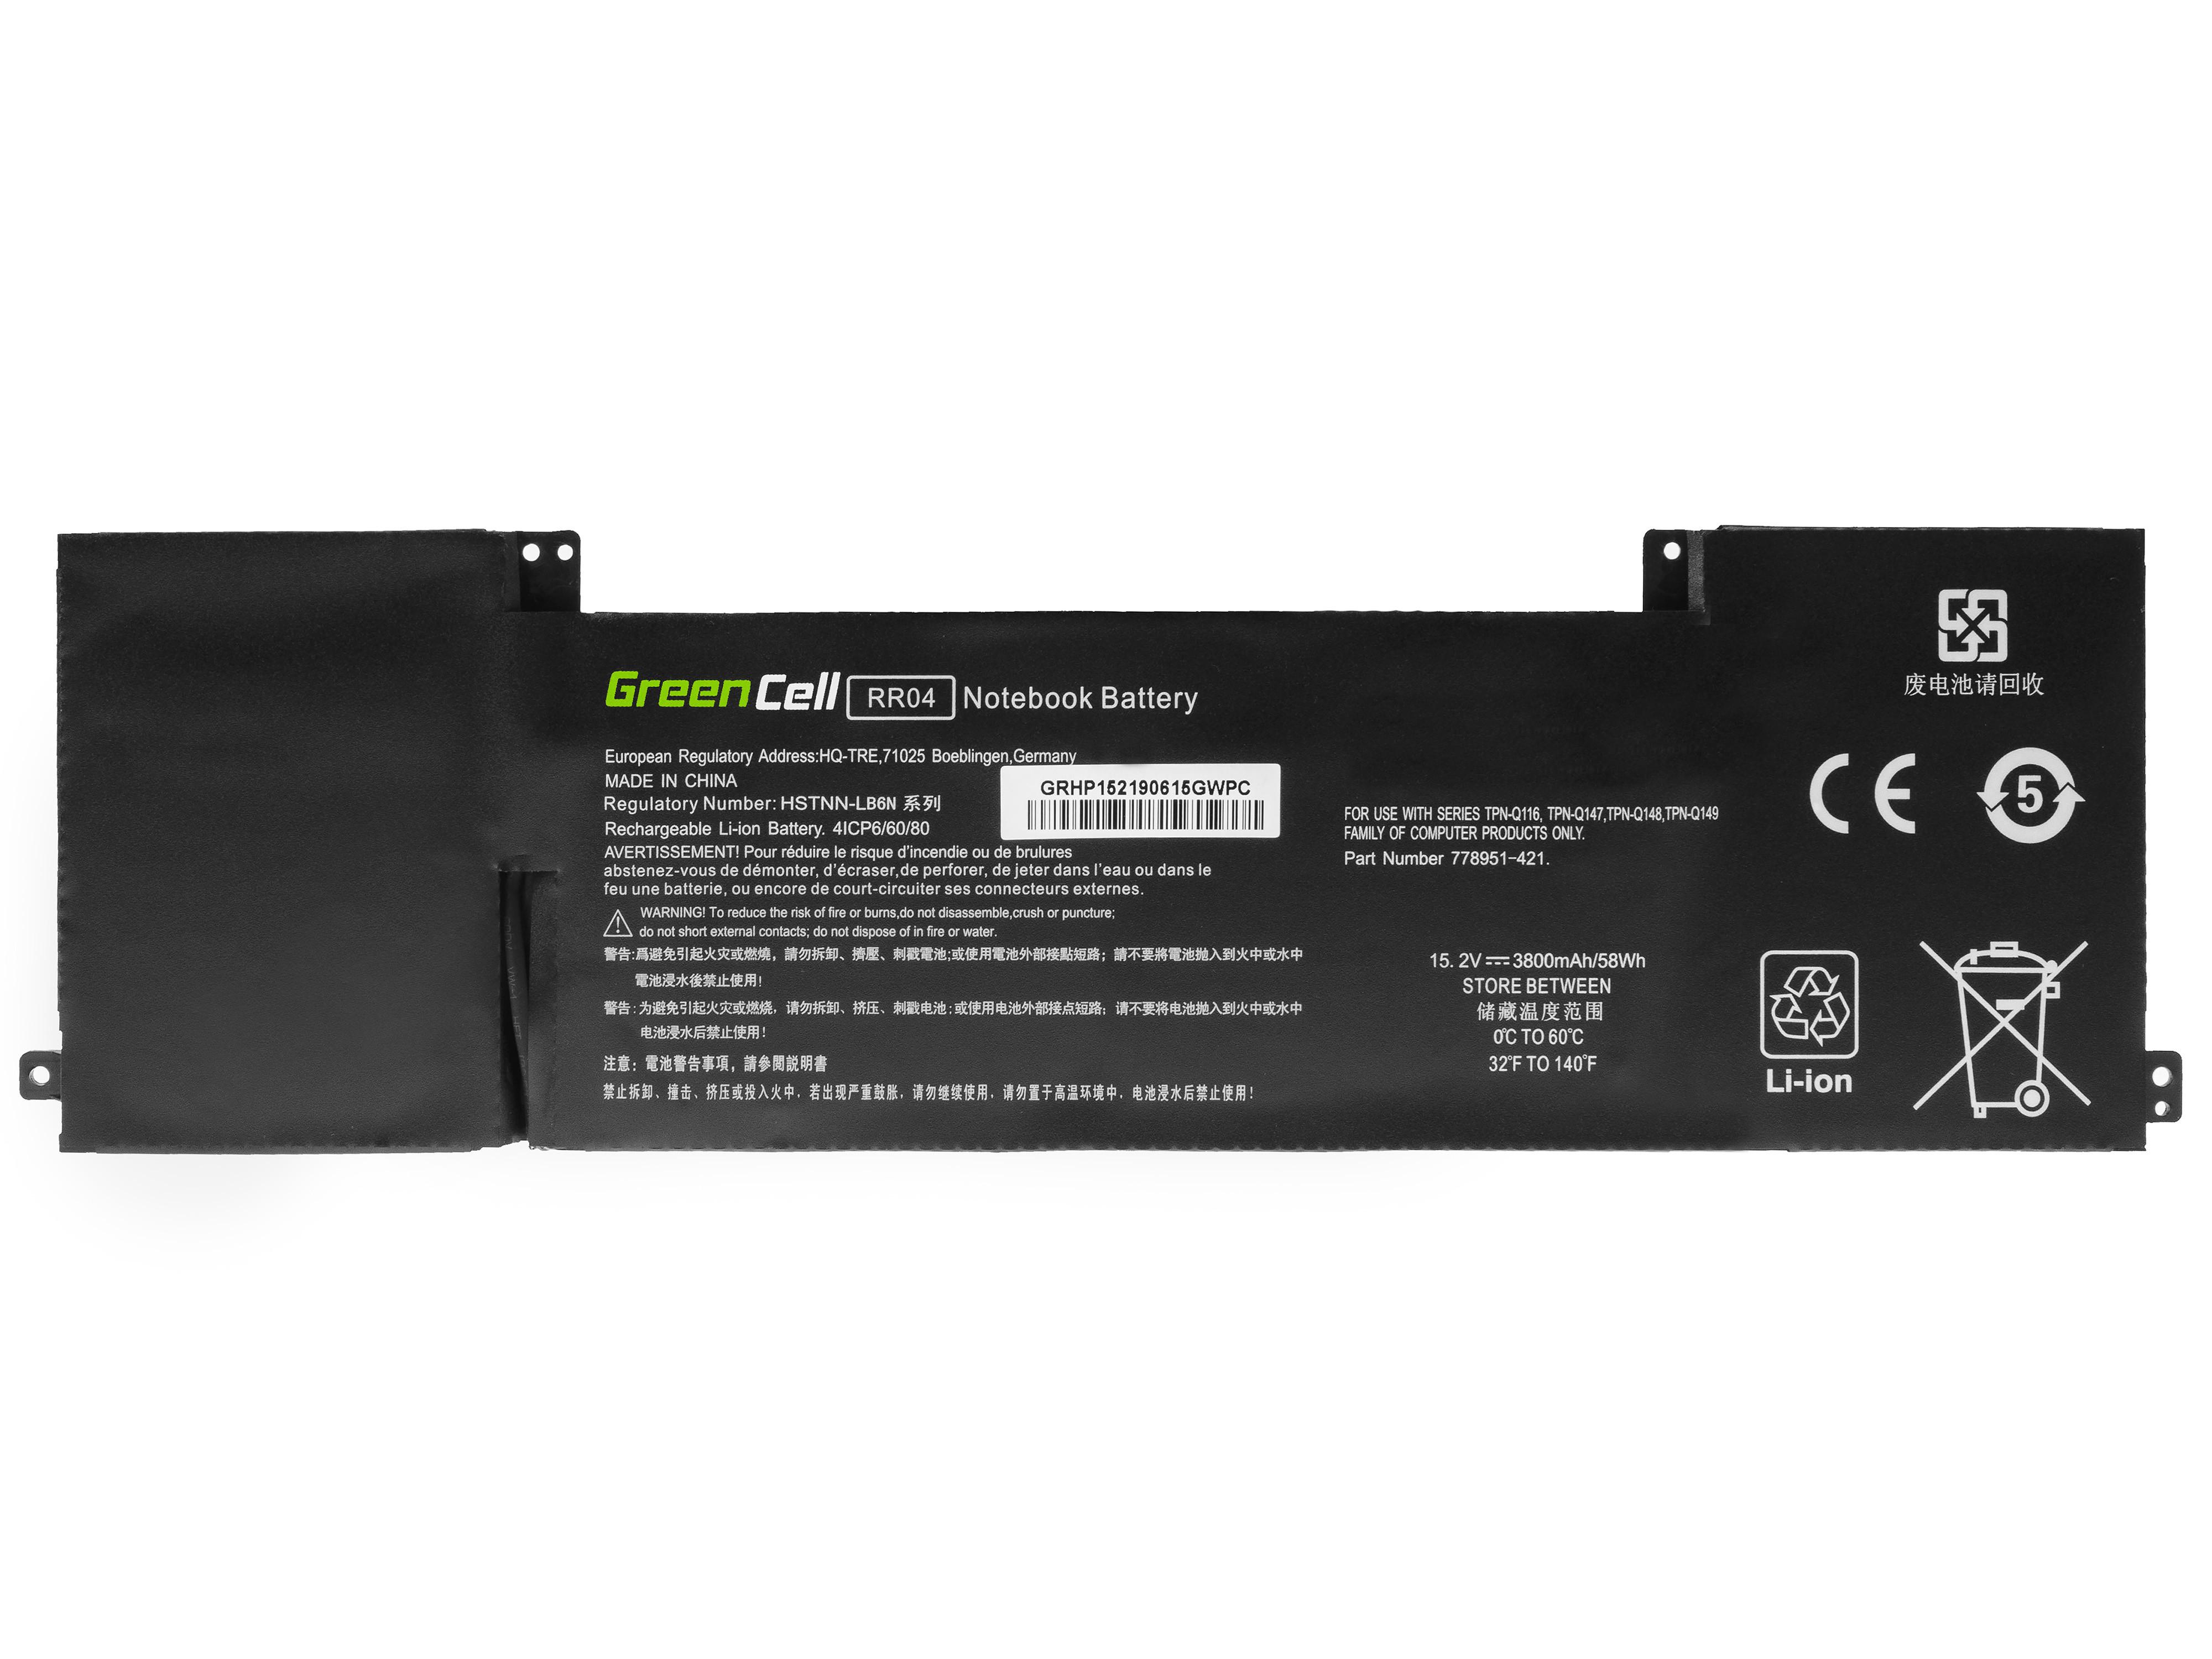 Green Cell HP152 Baterie HP RR04 pro HP Omen 15-5000 15-5000NW 15-5010NW, HP Omen Pro 15 3800mAh Li-Pol – neoriginální